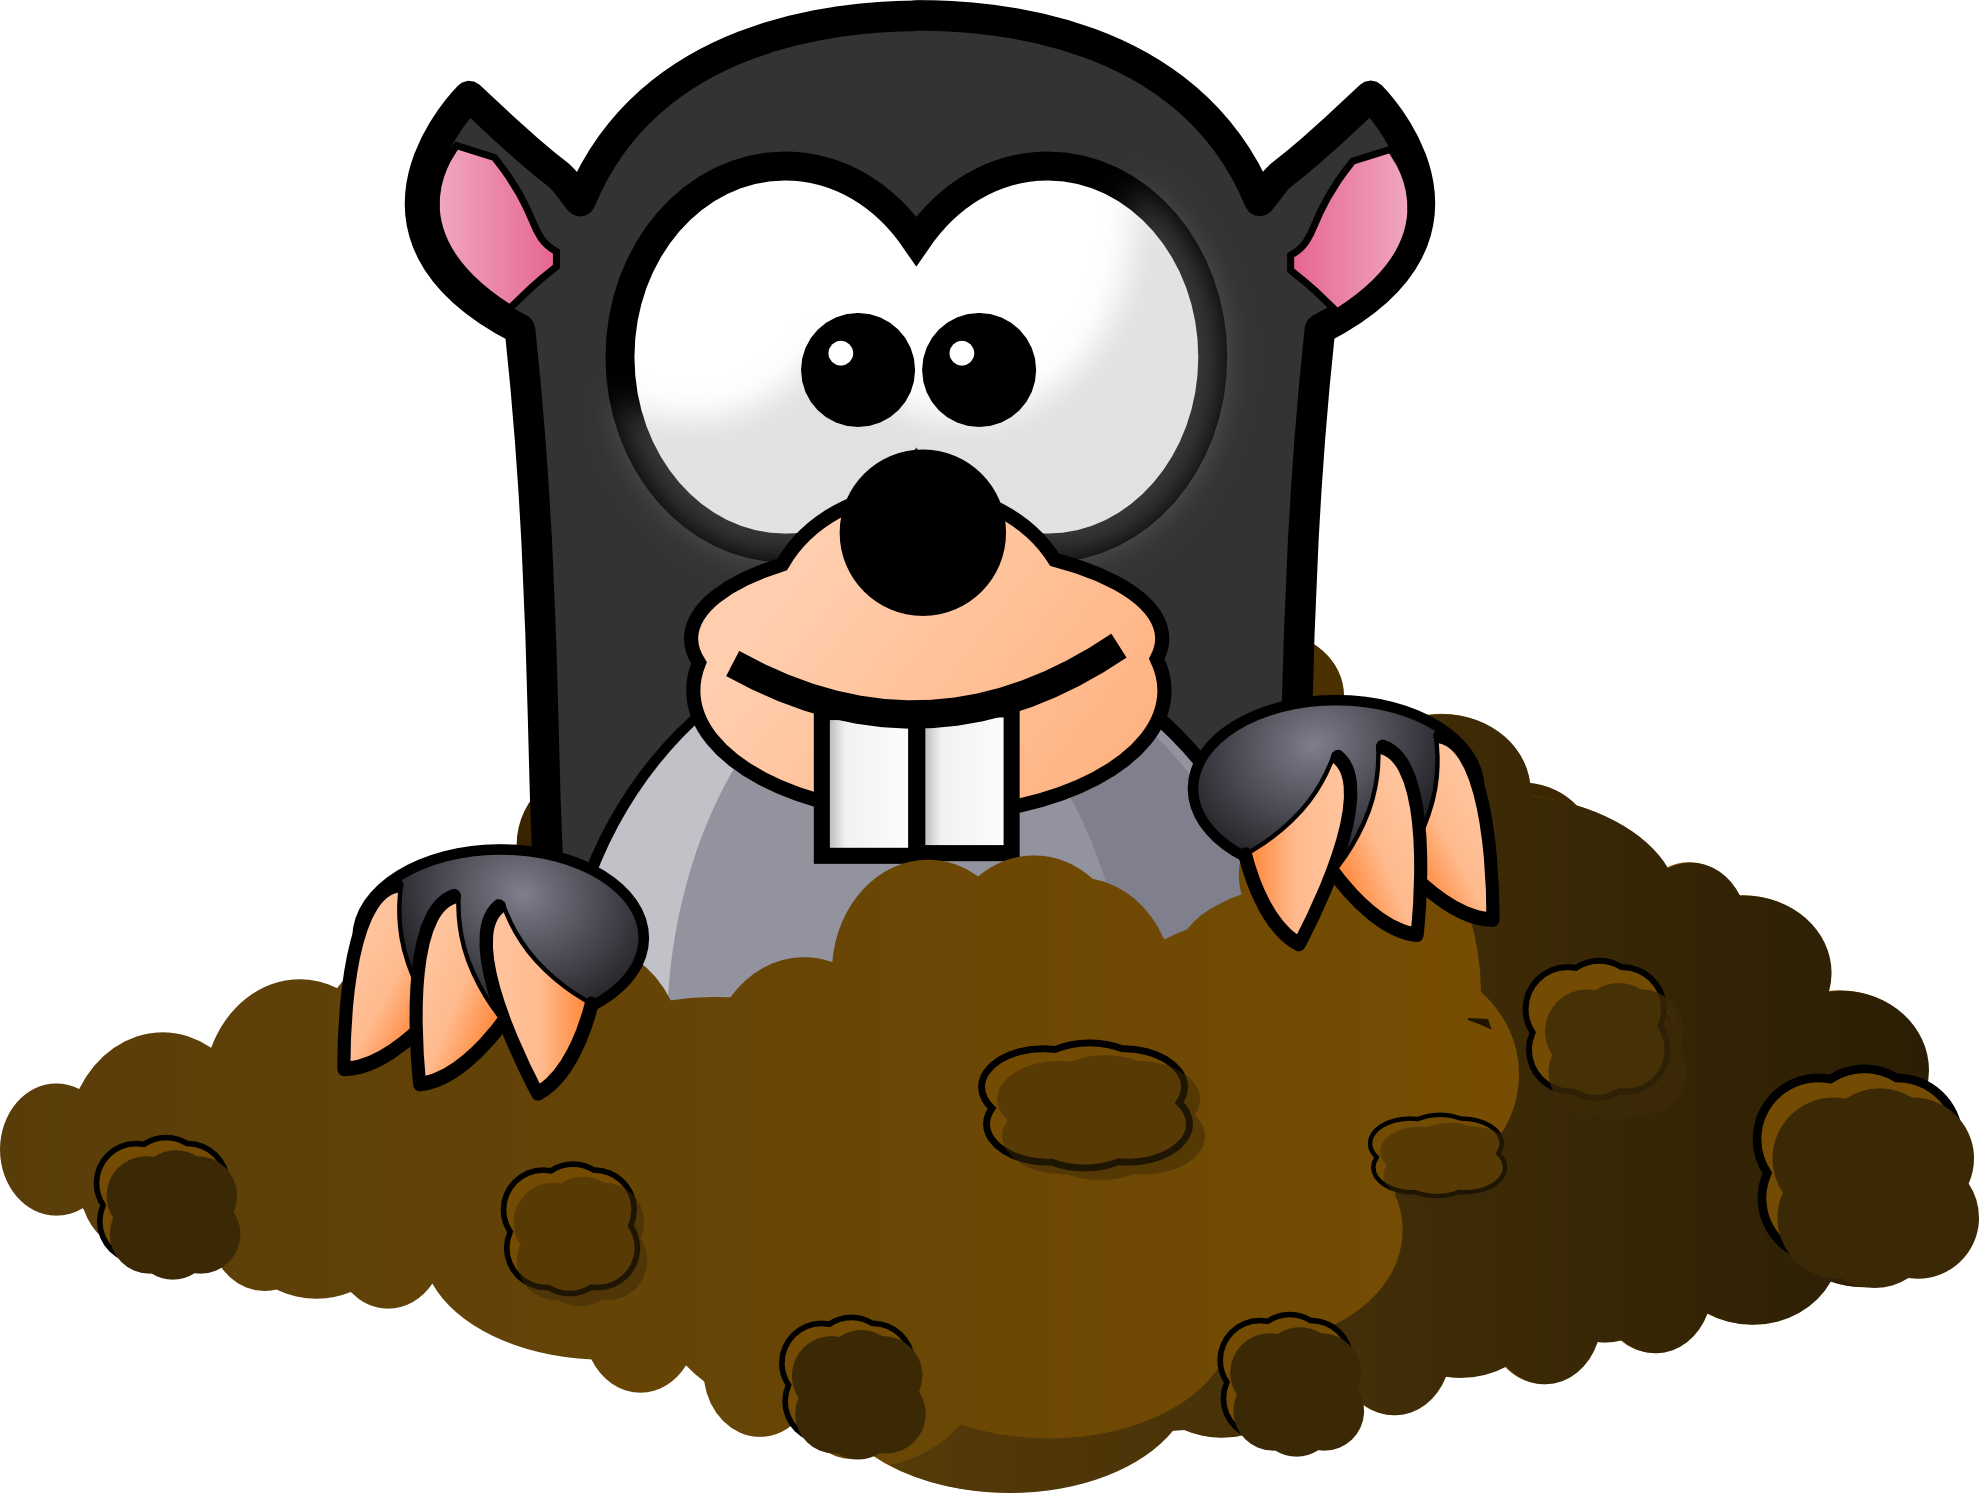 Hammer clipart whack a mole, Hammer whack a mole Transparent.